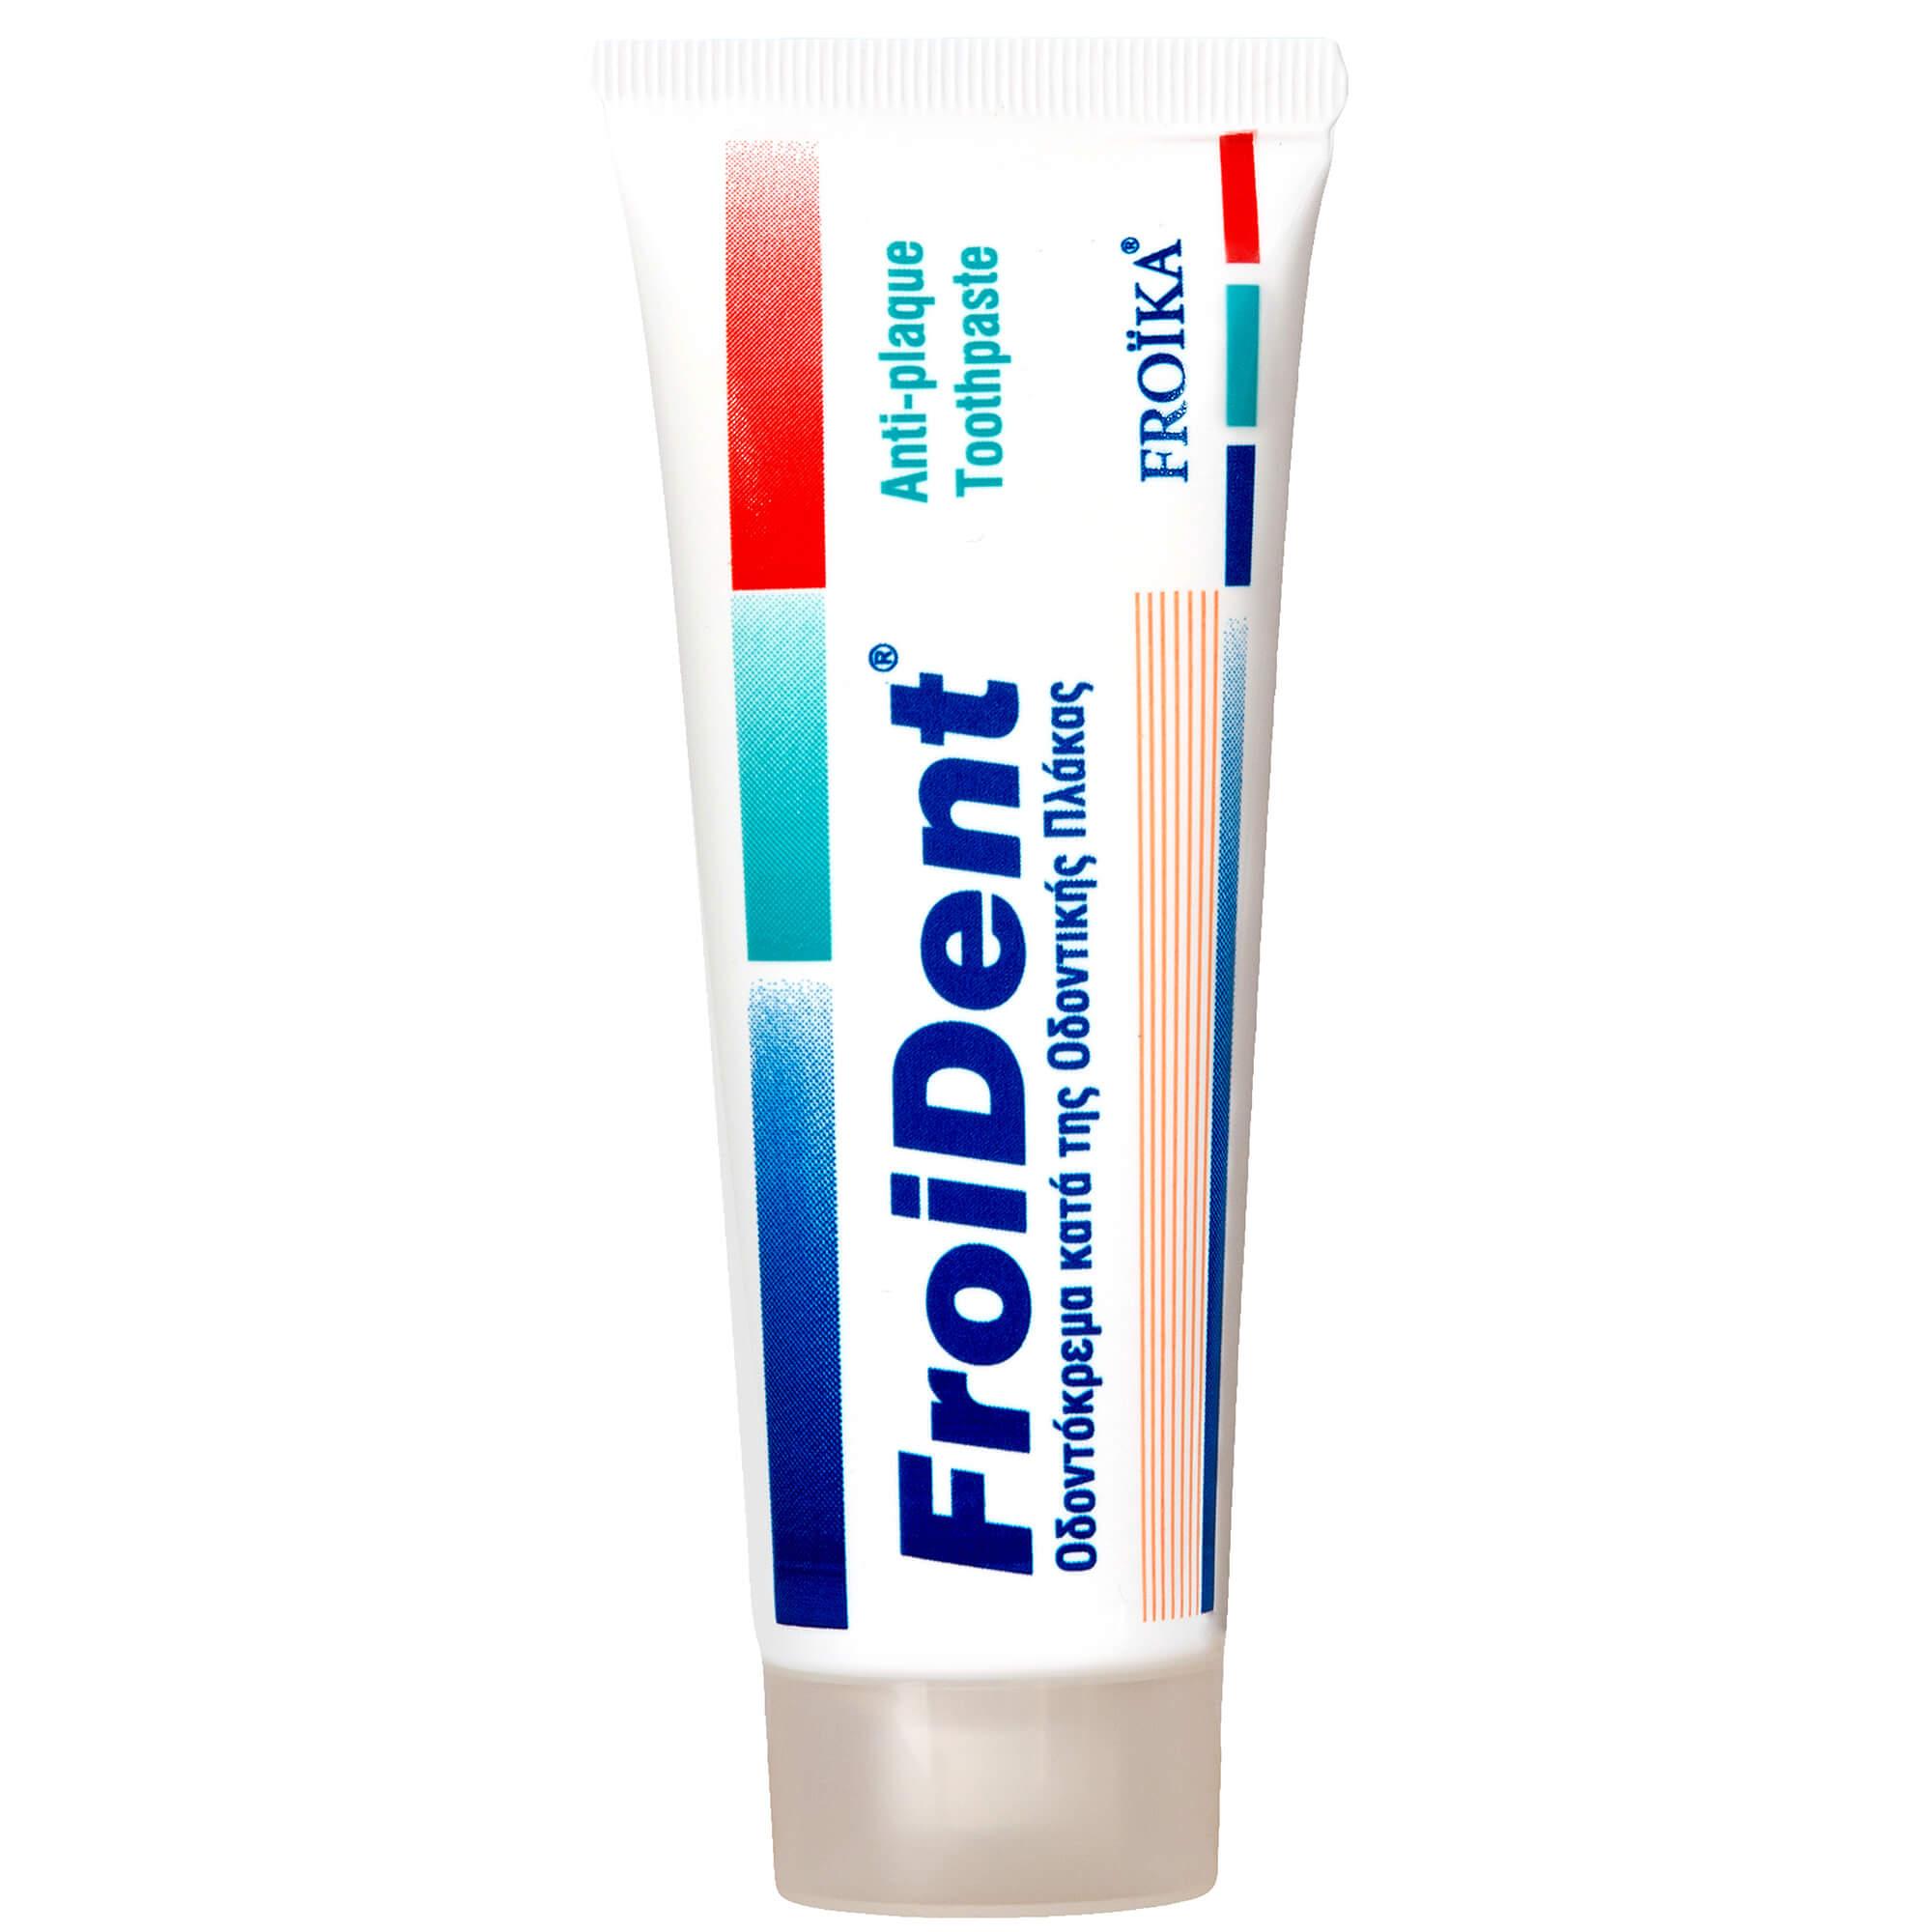 Froika Froident Dental Toothpaste Οδοντόκρεμα Κατά της Οδοντικής Πλάκας 75ml υγιεινή   στοματική υγιεινή   oδοντόκρεμες για ερεθισμένα ούλα  ενδυνάμωση